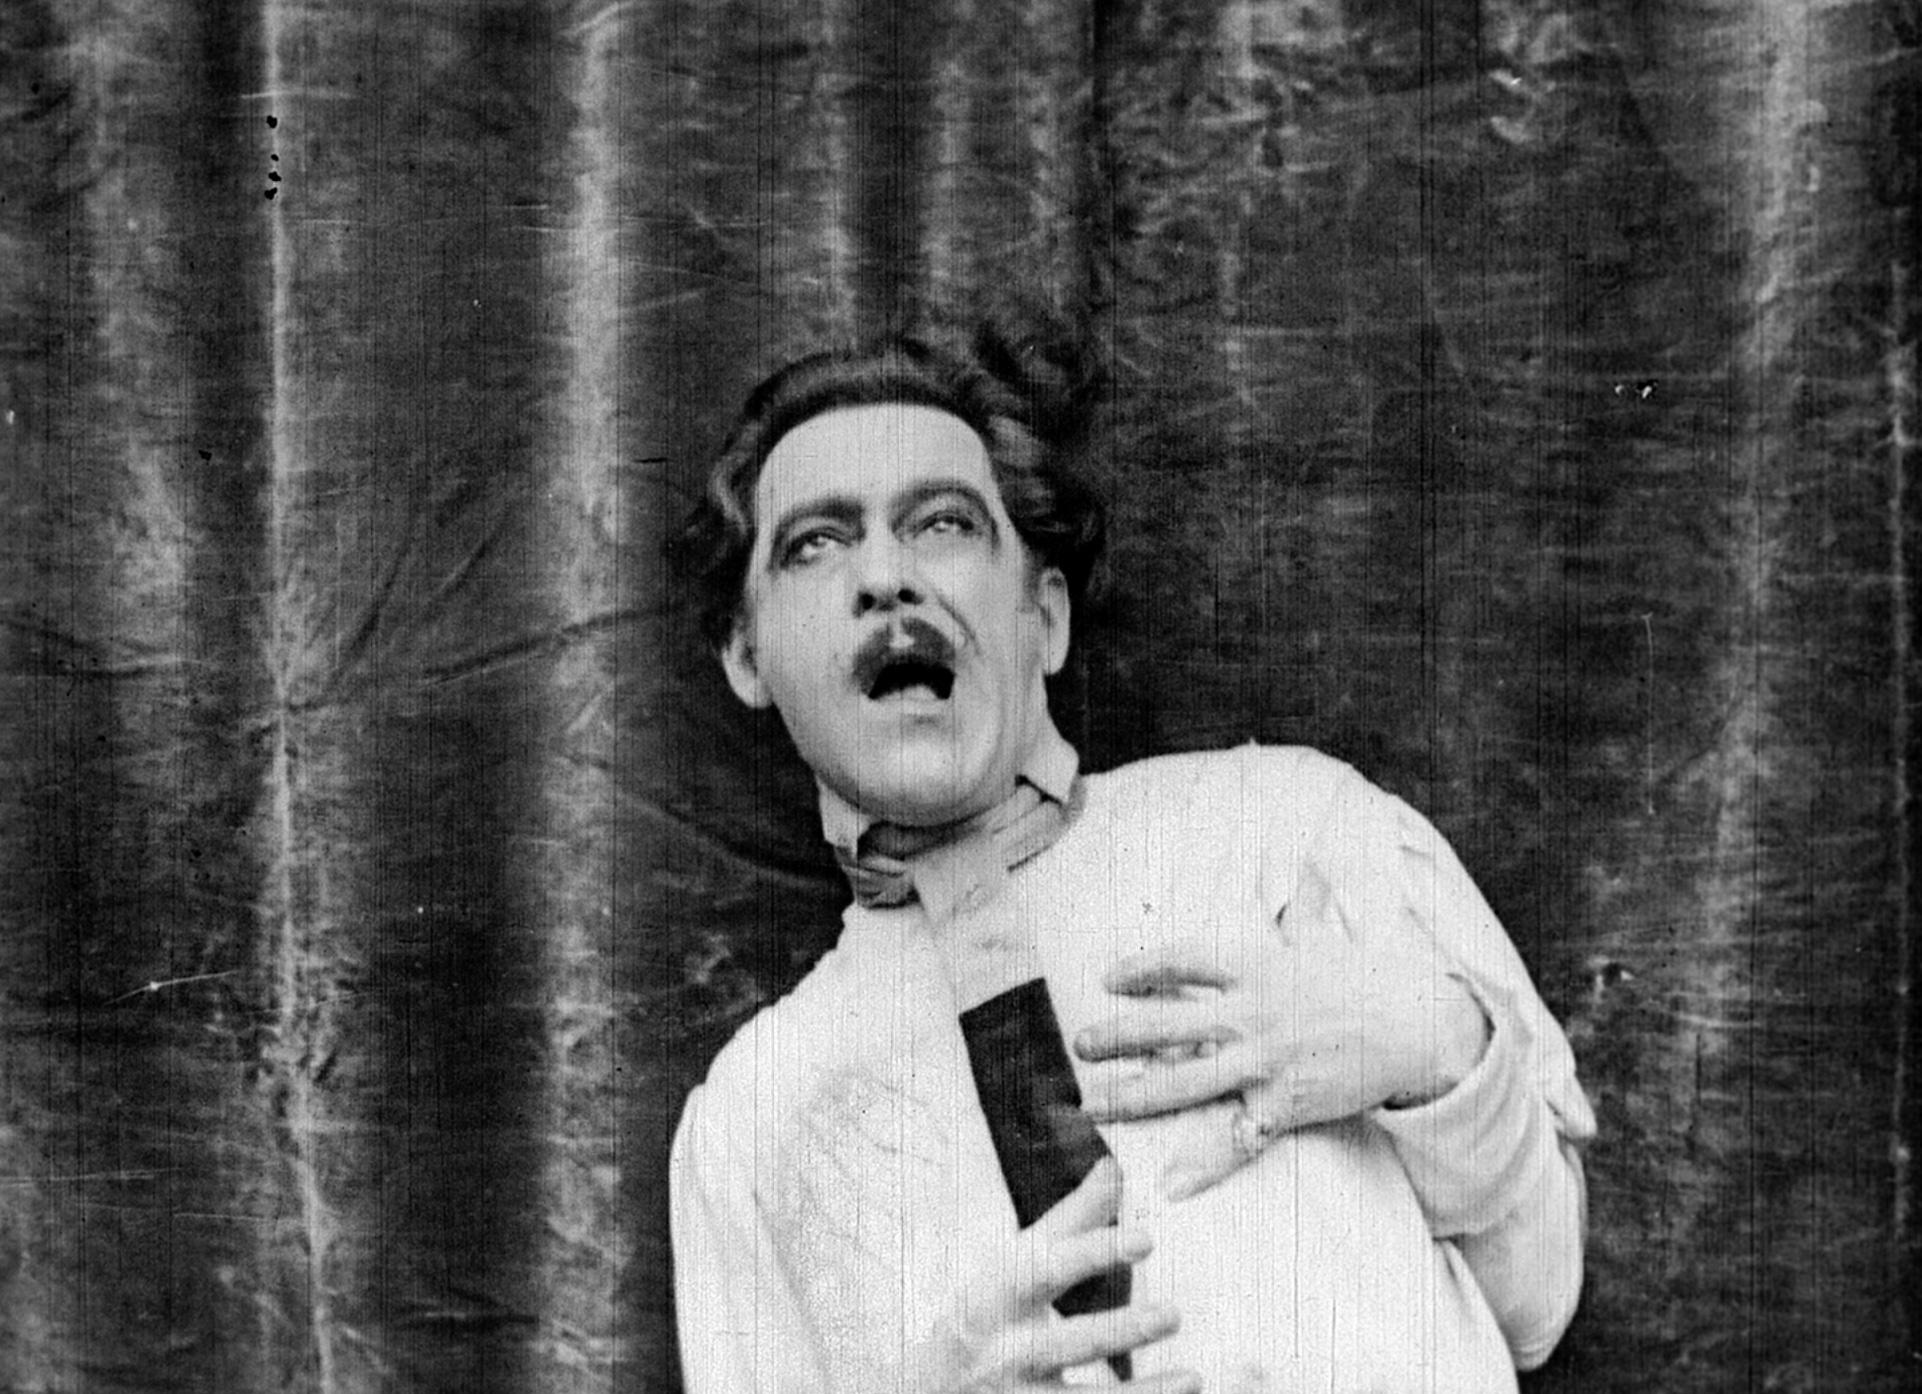 Gaspard (John Charles) dies in the silent film Bitter Fruit (1920)